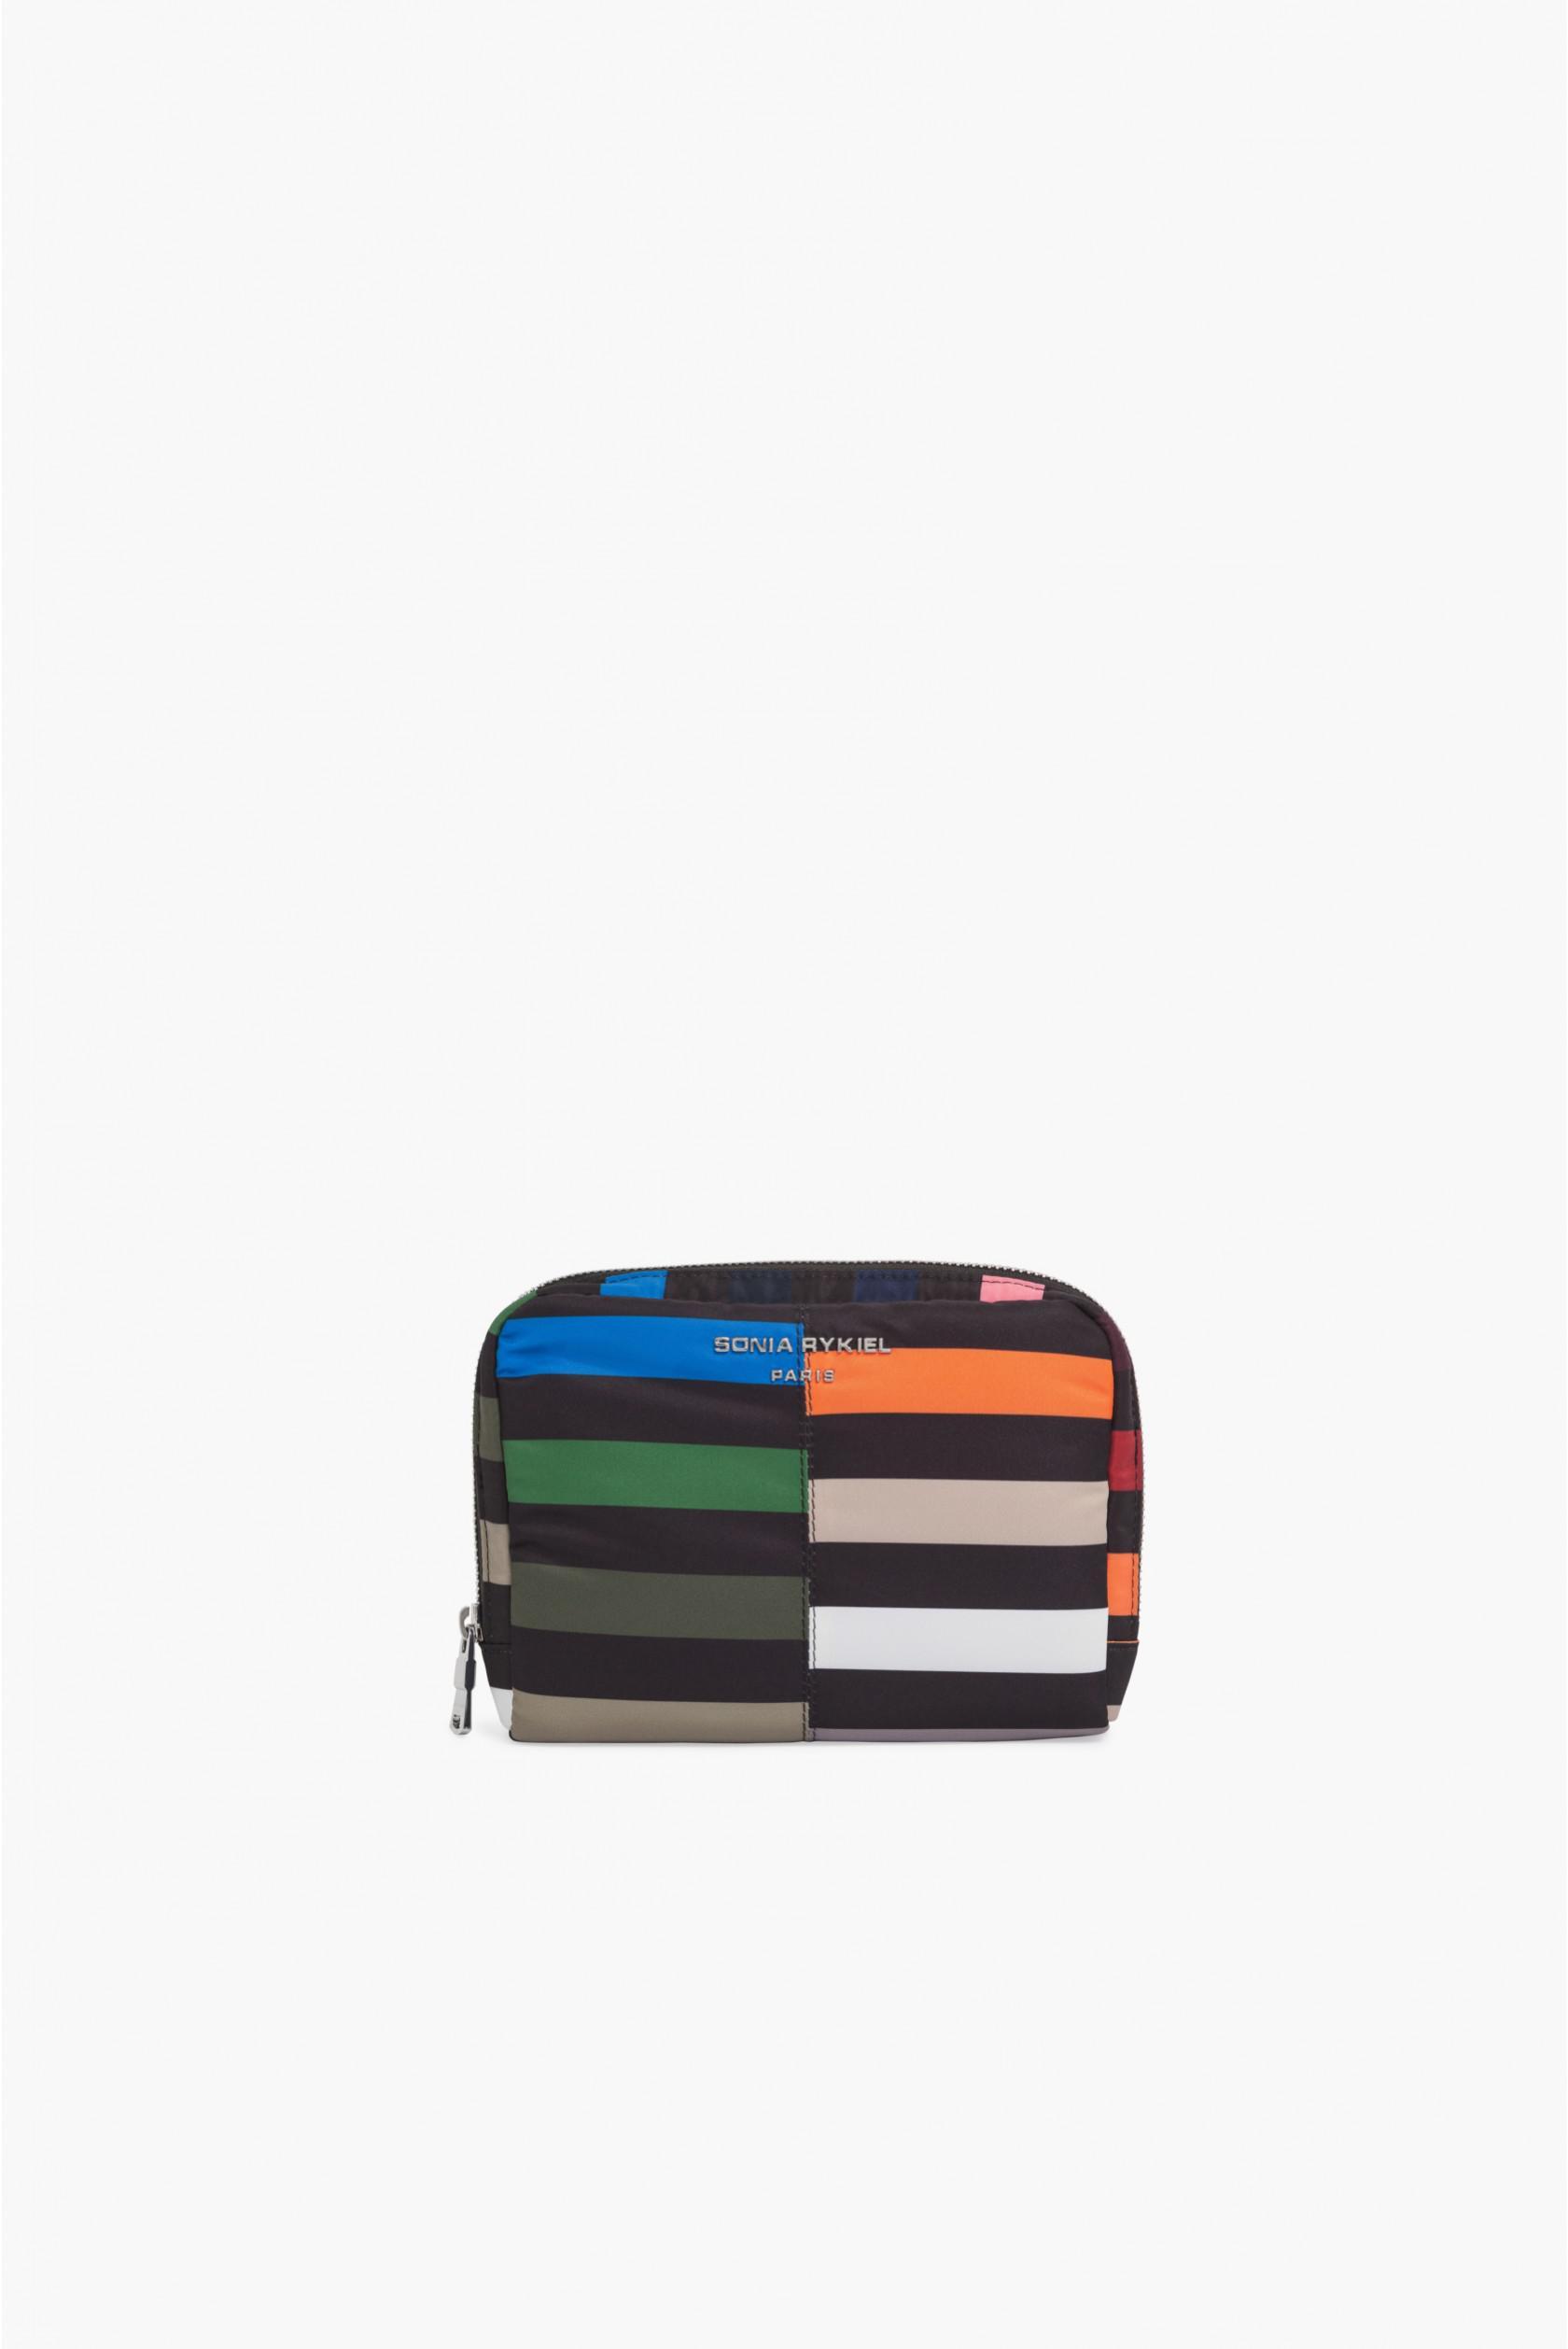 857ef38d8 Sonia Rykiel Forever Nylon Multicolored Zip Pencil Case in Blue - Lyst